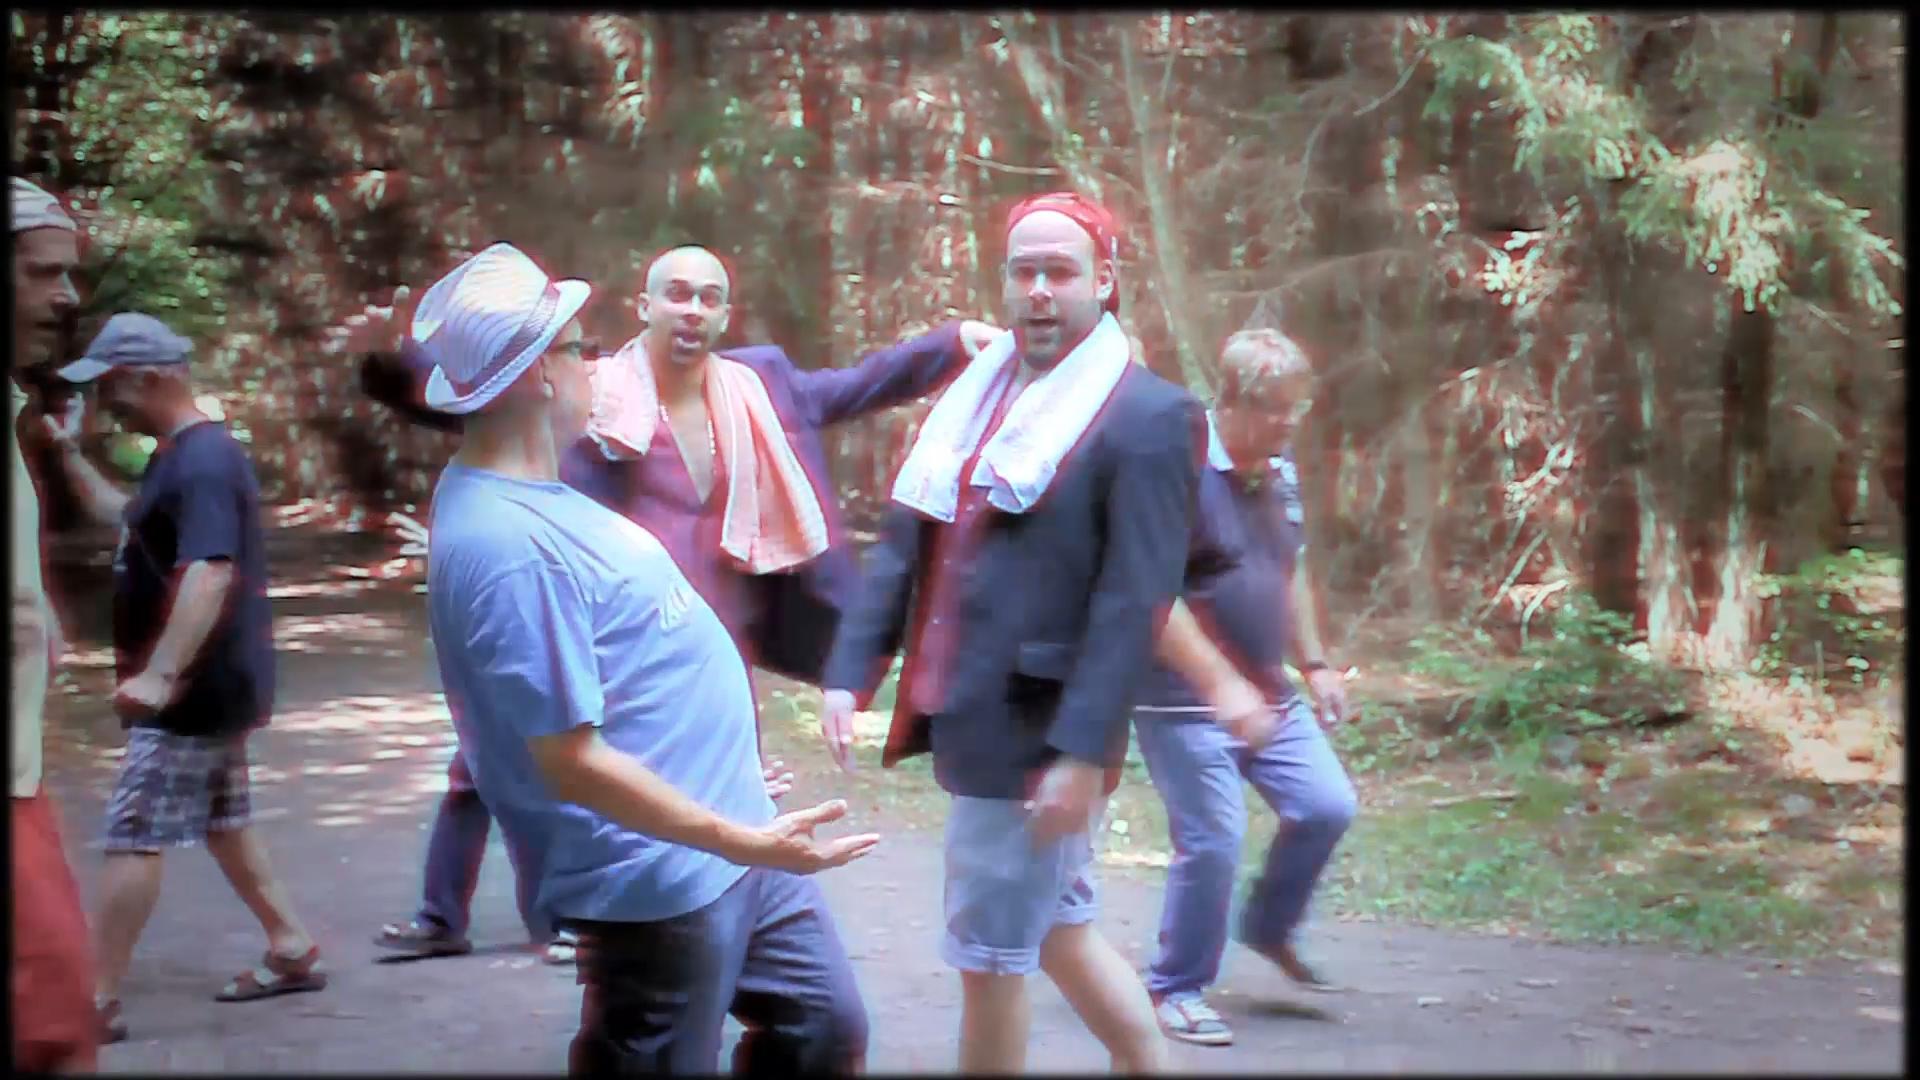 Borismann ft. Angry Teng & Sternmorgenstern_Video.mp4.00_00_57_00.Standbild010